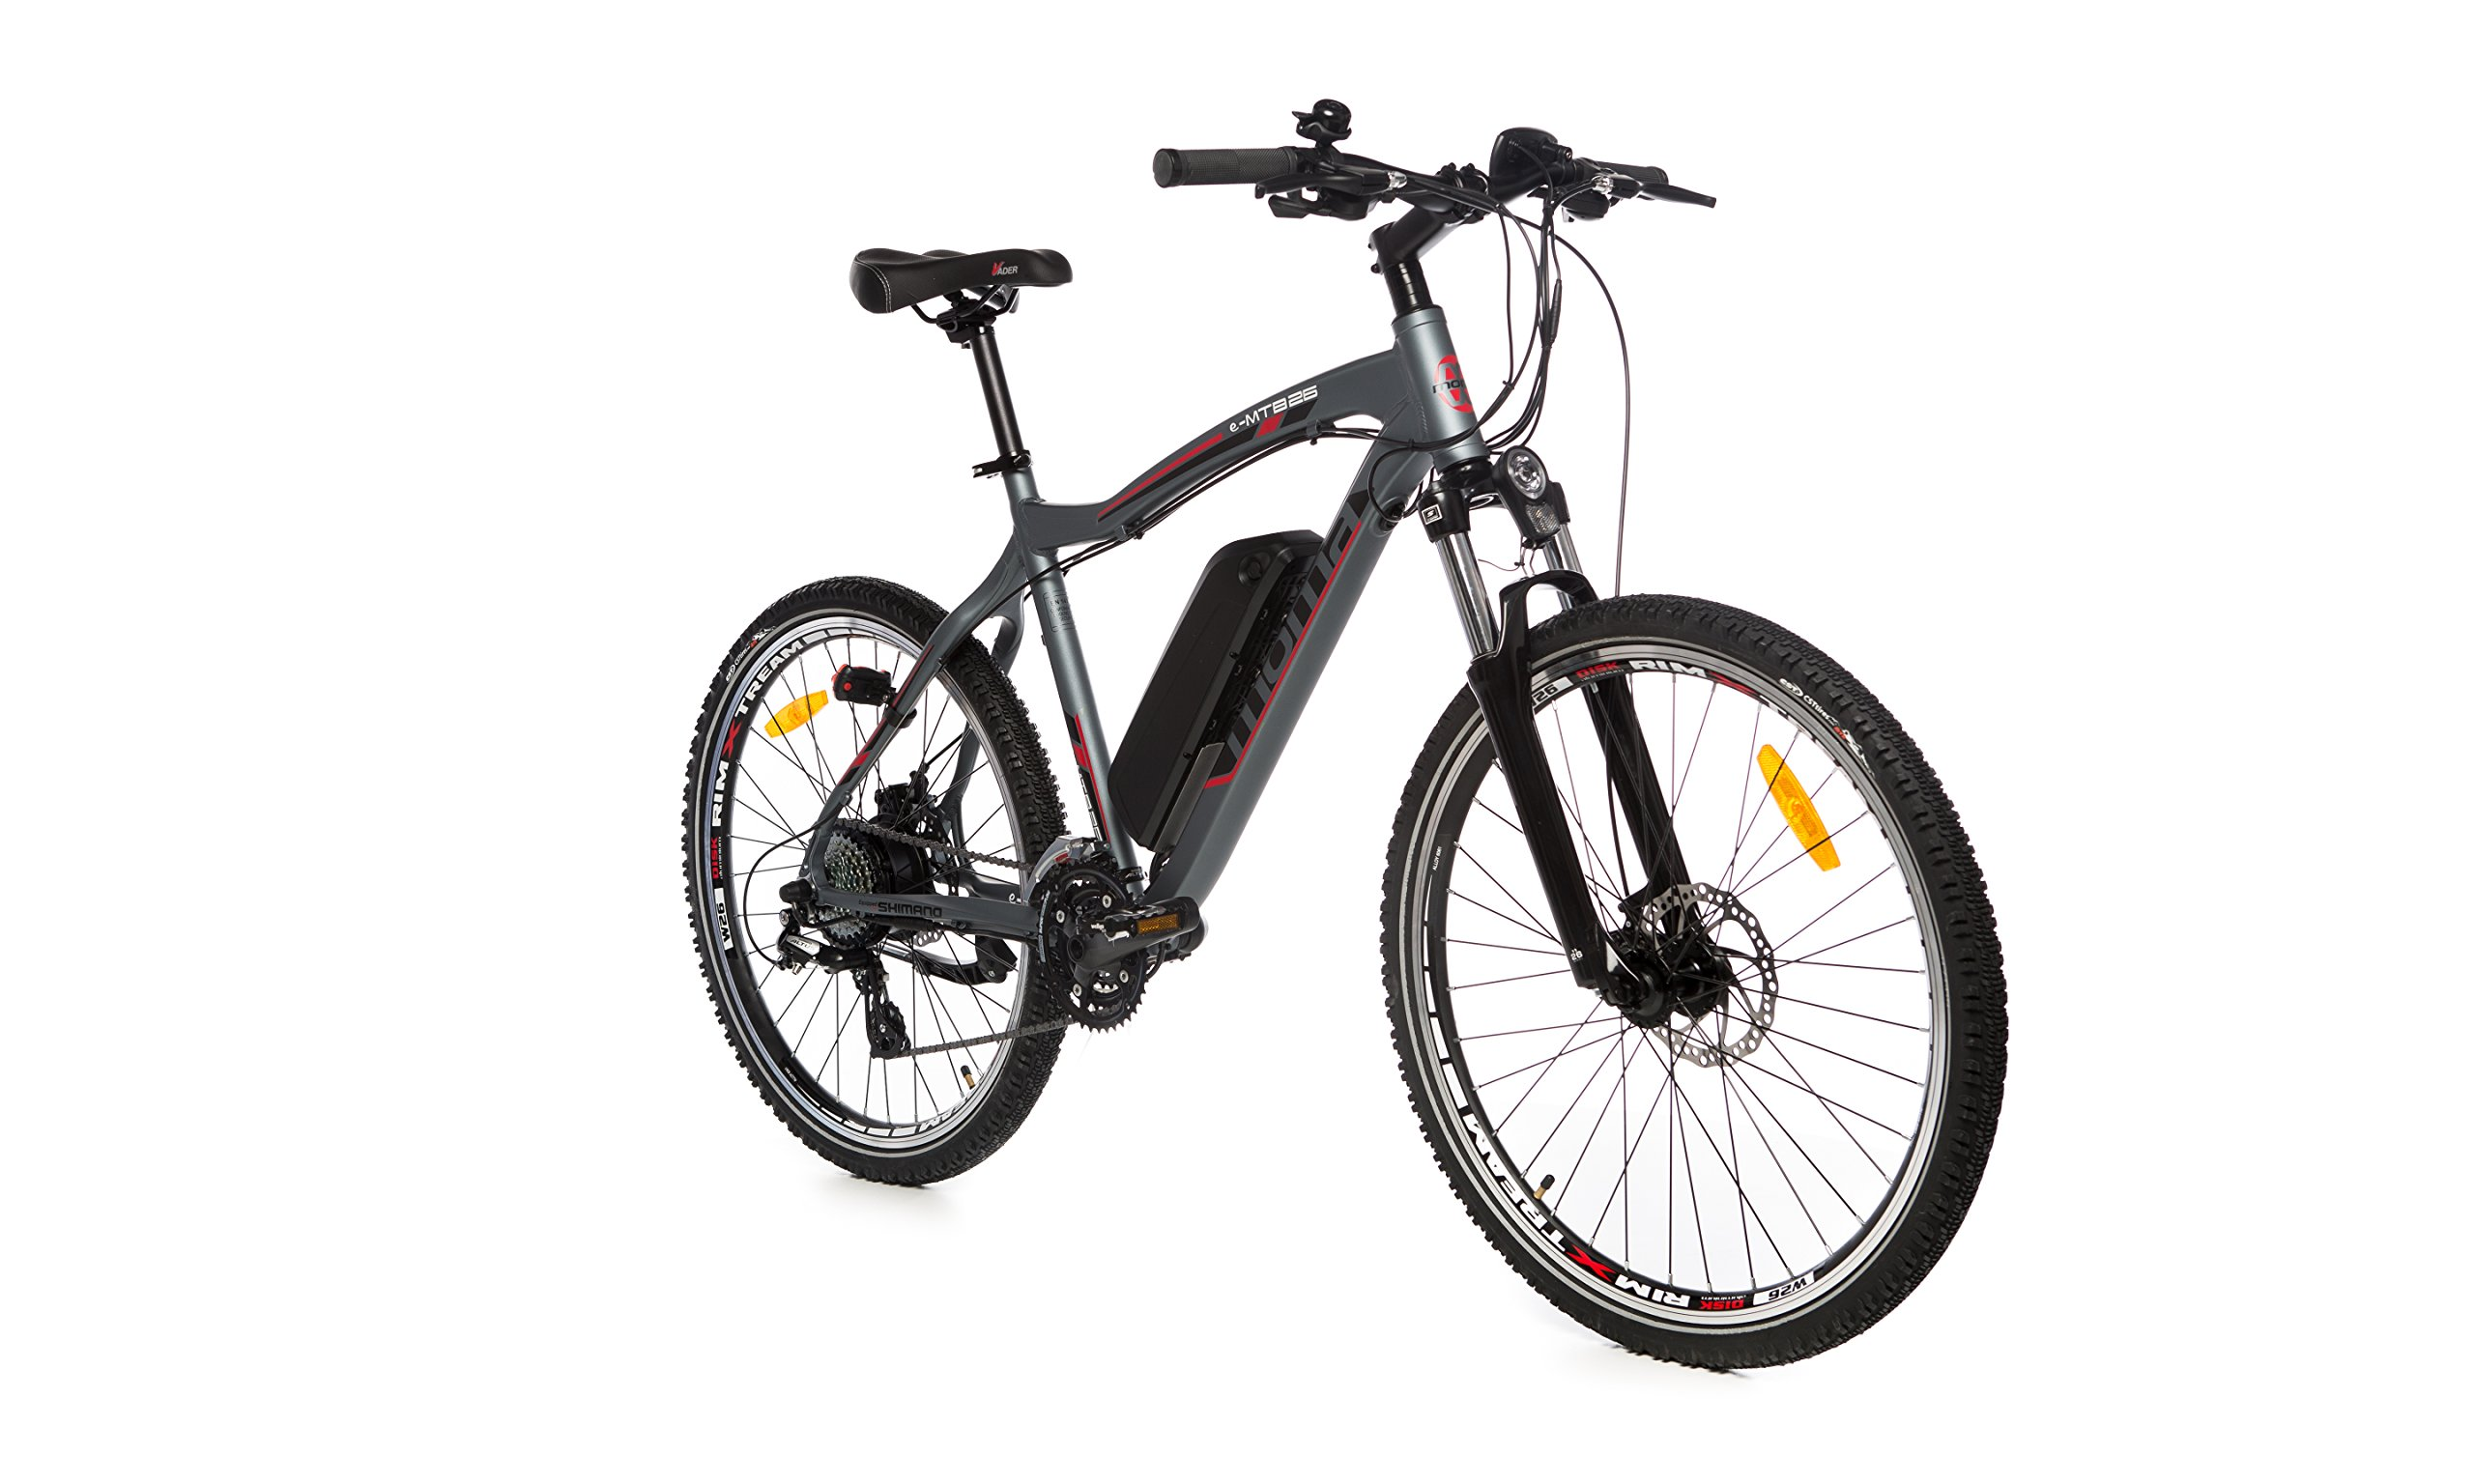 "Moma Bikes Vélo VTT Electrique VAE , E-MTB 26"", Aluminium, SHIMANO 24V, Freins a Disque, Suspension Avant, Bat. Ion Lithium 36V 16Ah product image"